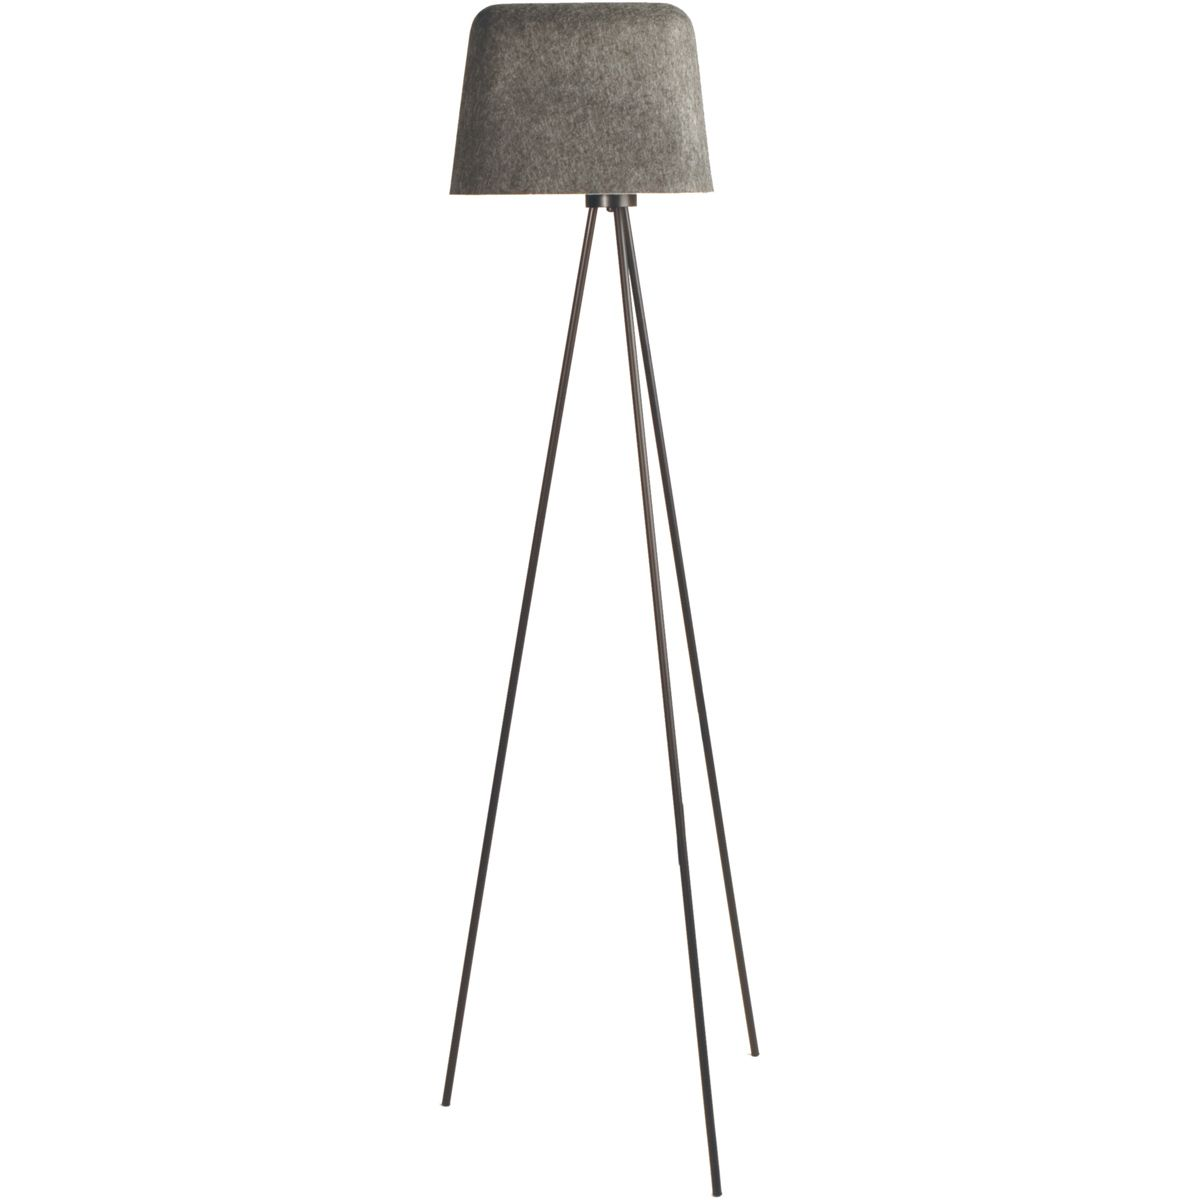 Tom Dixon Felt Shade Floor Lamp Basement Flooring Floor Lamp Diy Flooring